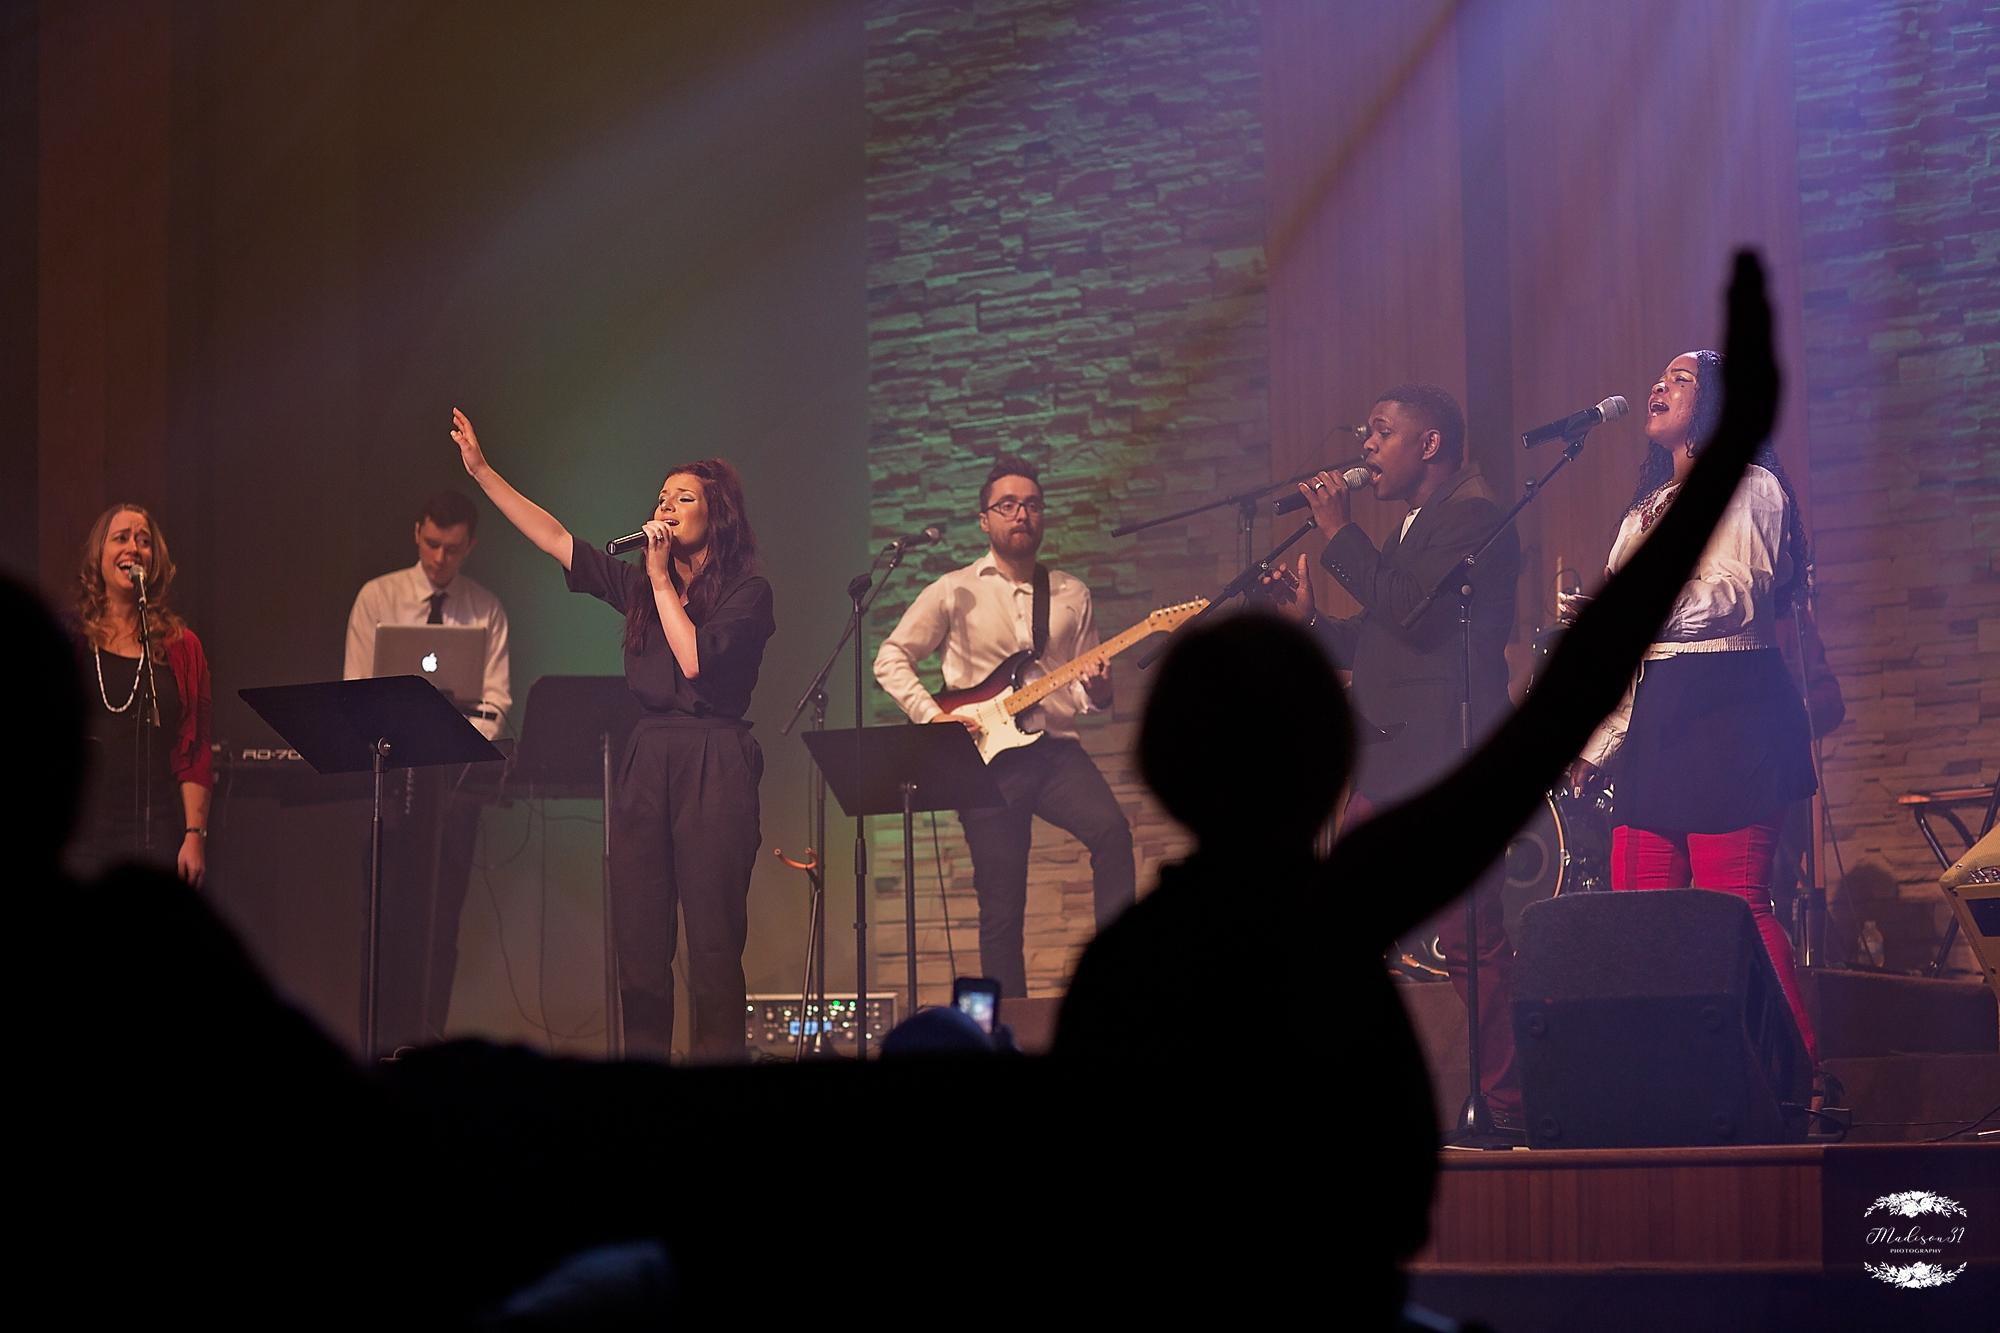 A night of Love&Worship_0322 copy.jpg